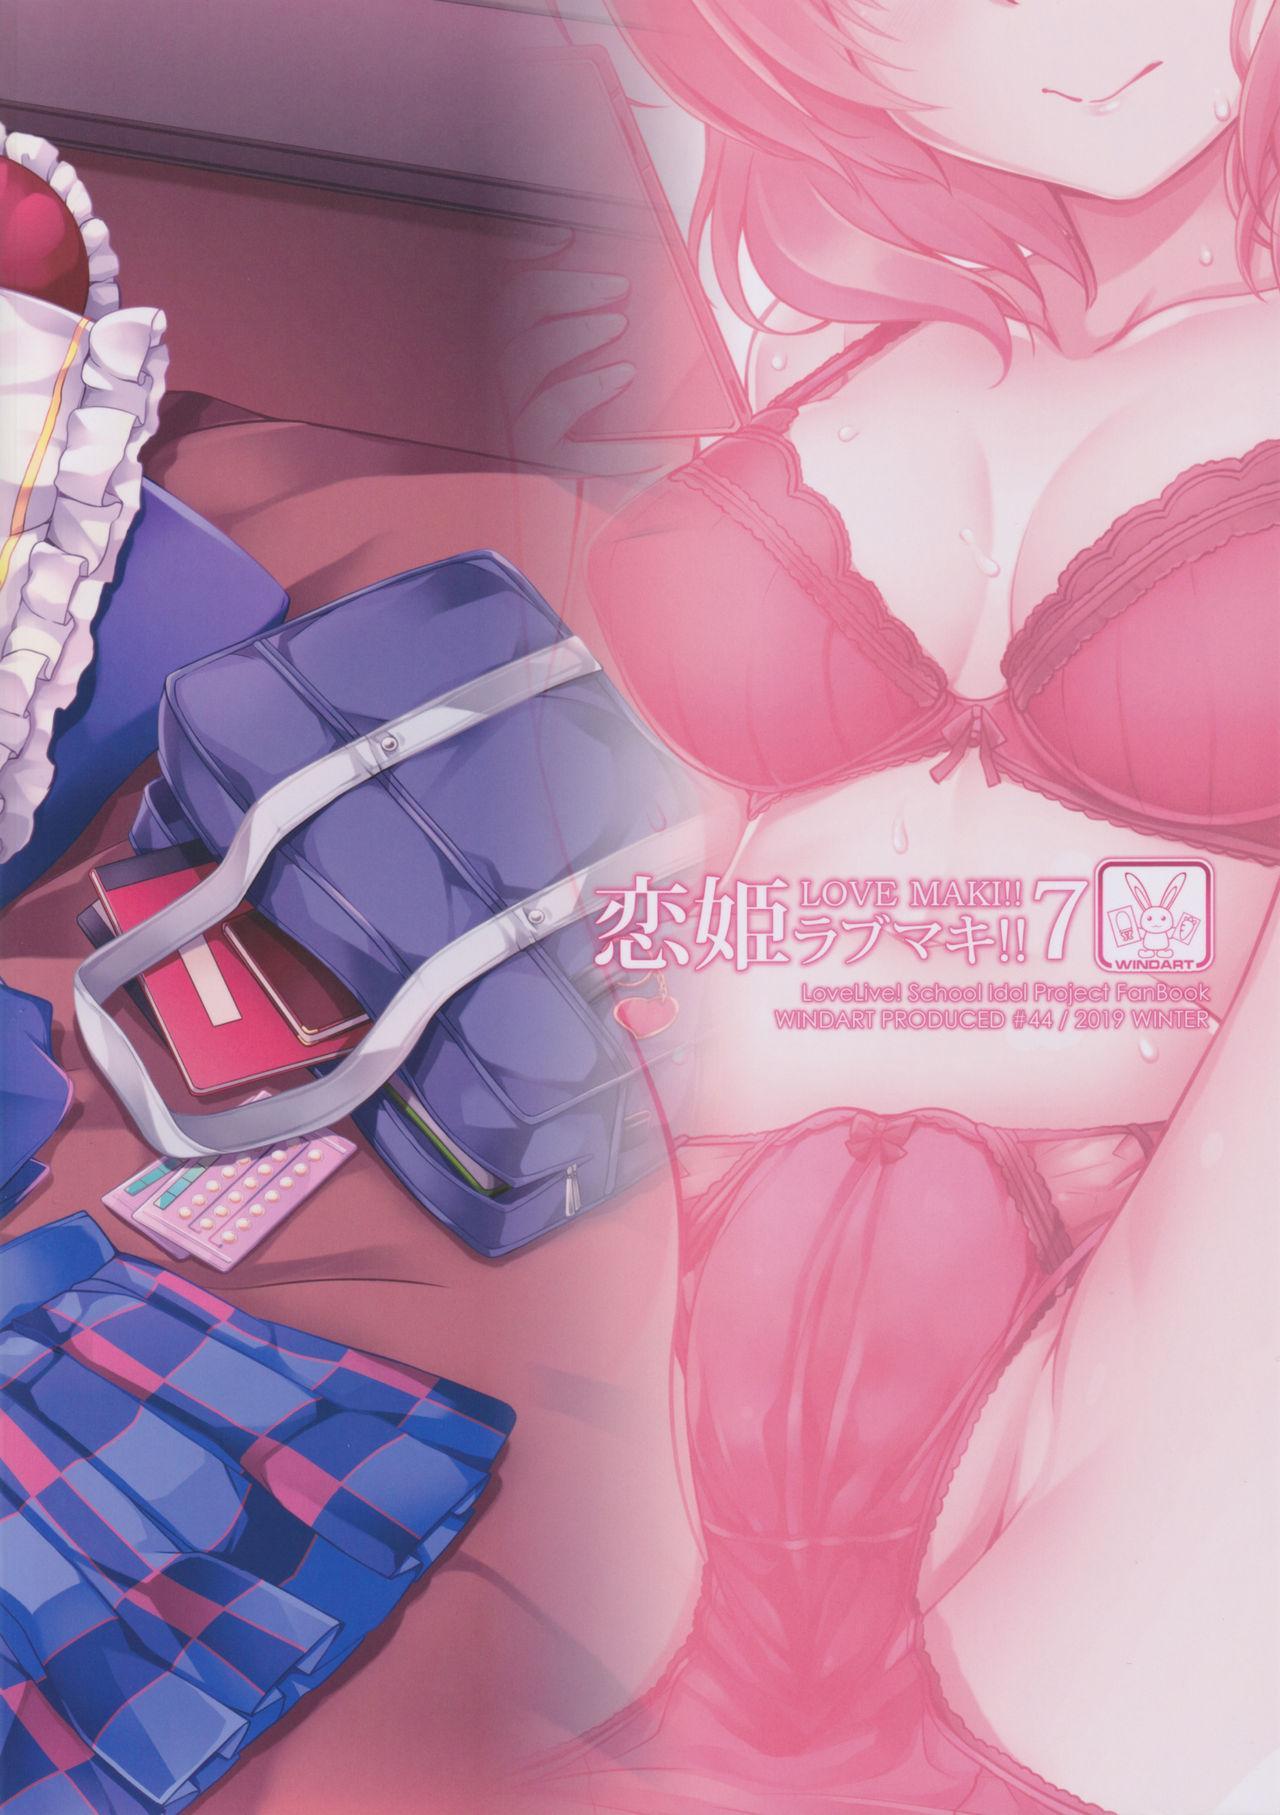 Koi Hime Love Maki!! 7 37